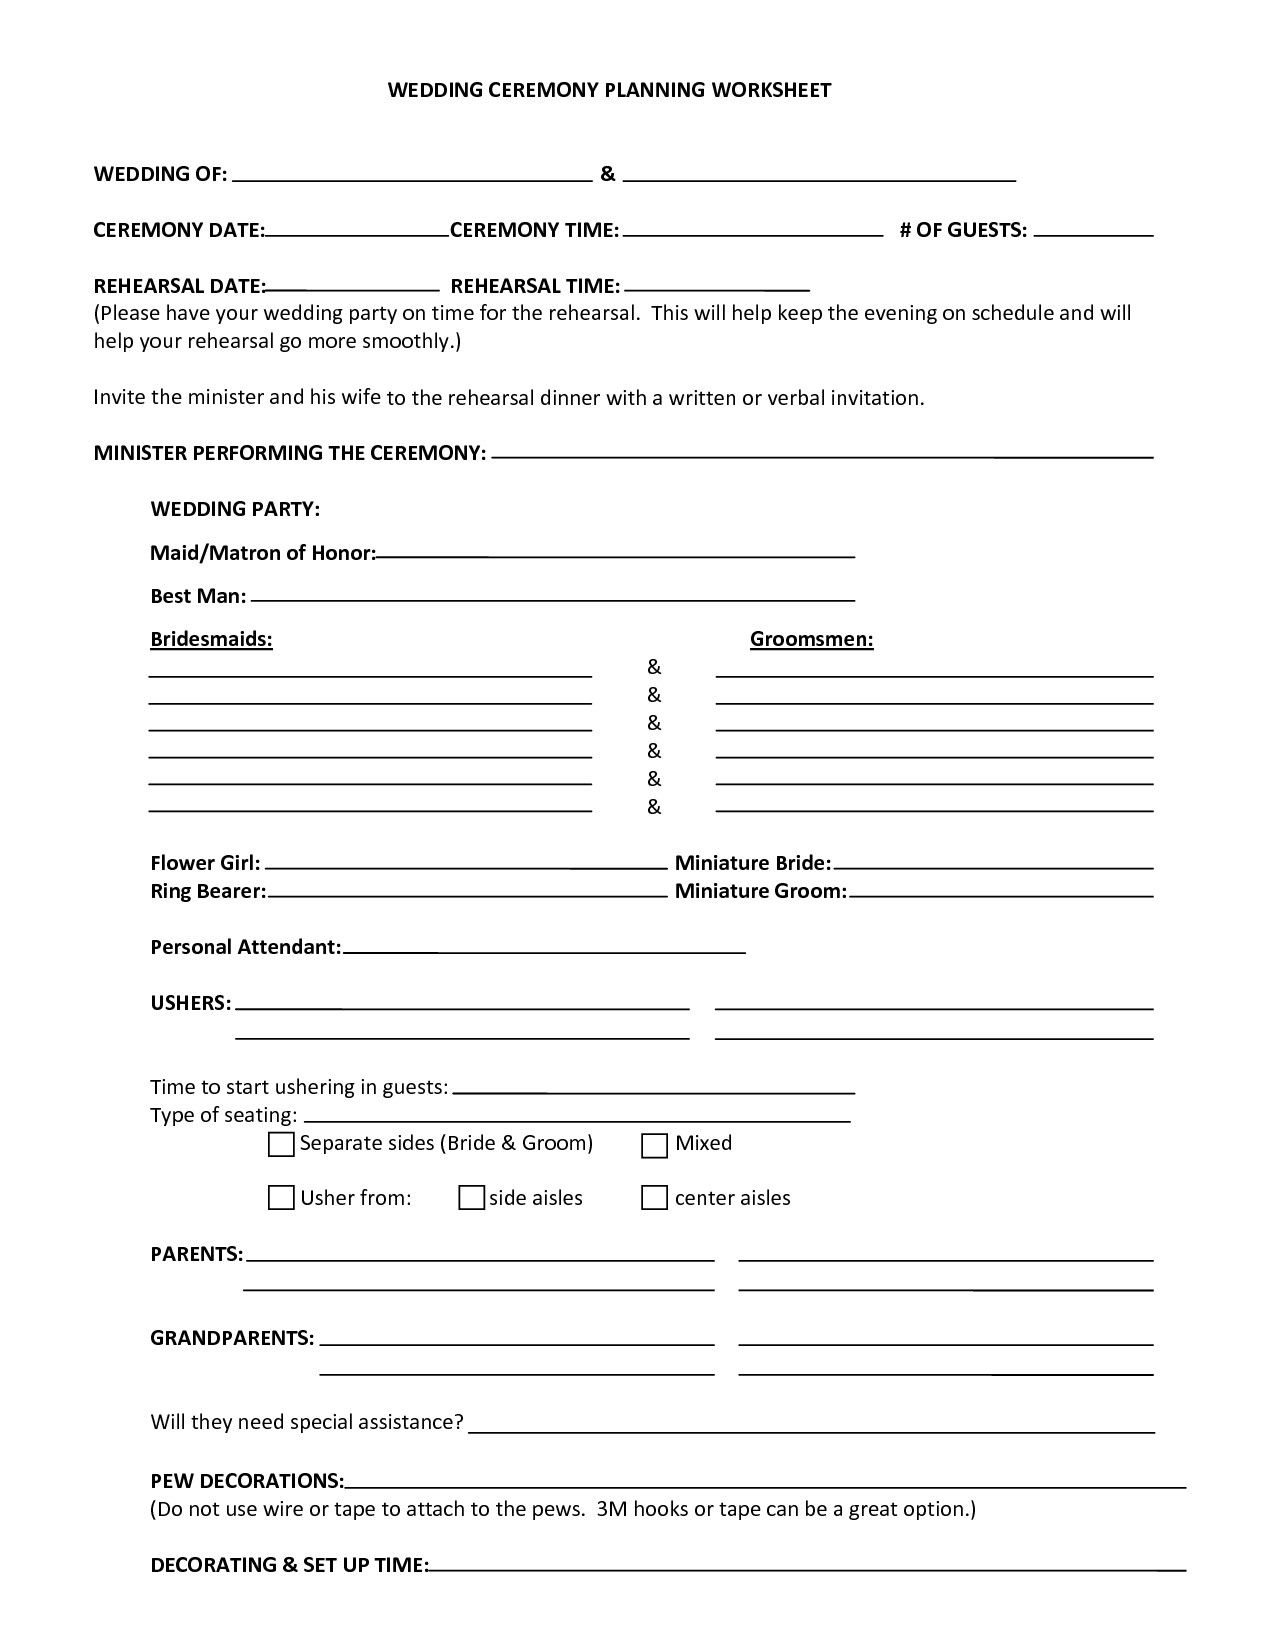 Wedding Planner Worksheets Pdf Beautiful Wedding Printable Gallery Category Page 2 Free Wedding Printables Wedding Printables Wedding Planning Worksheet